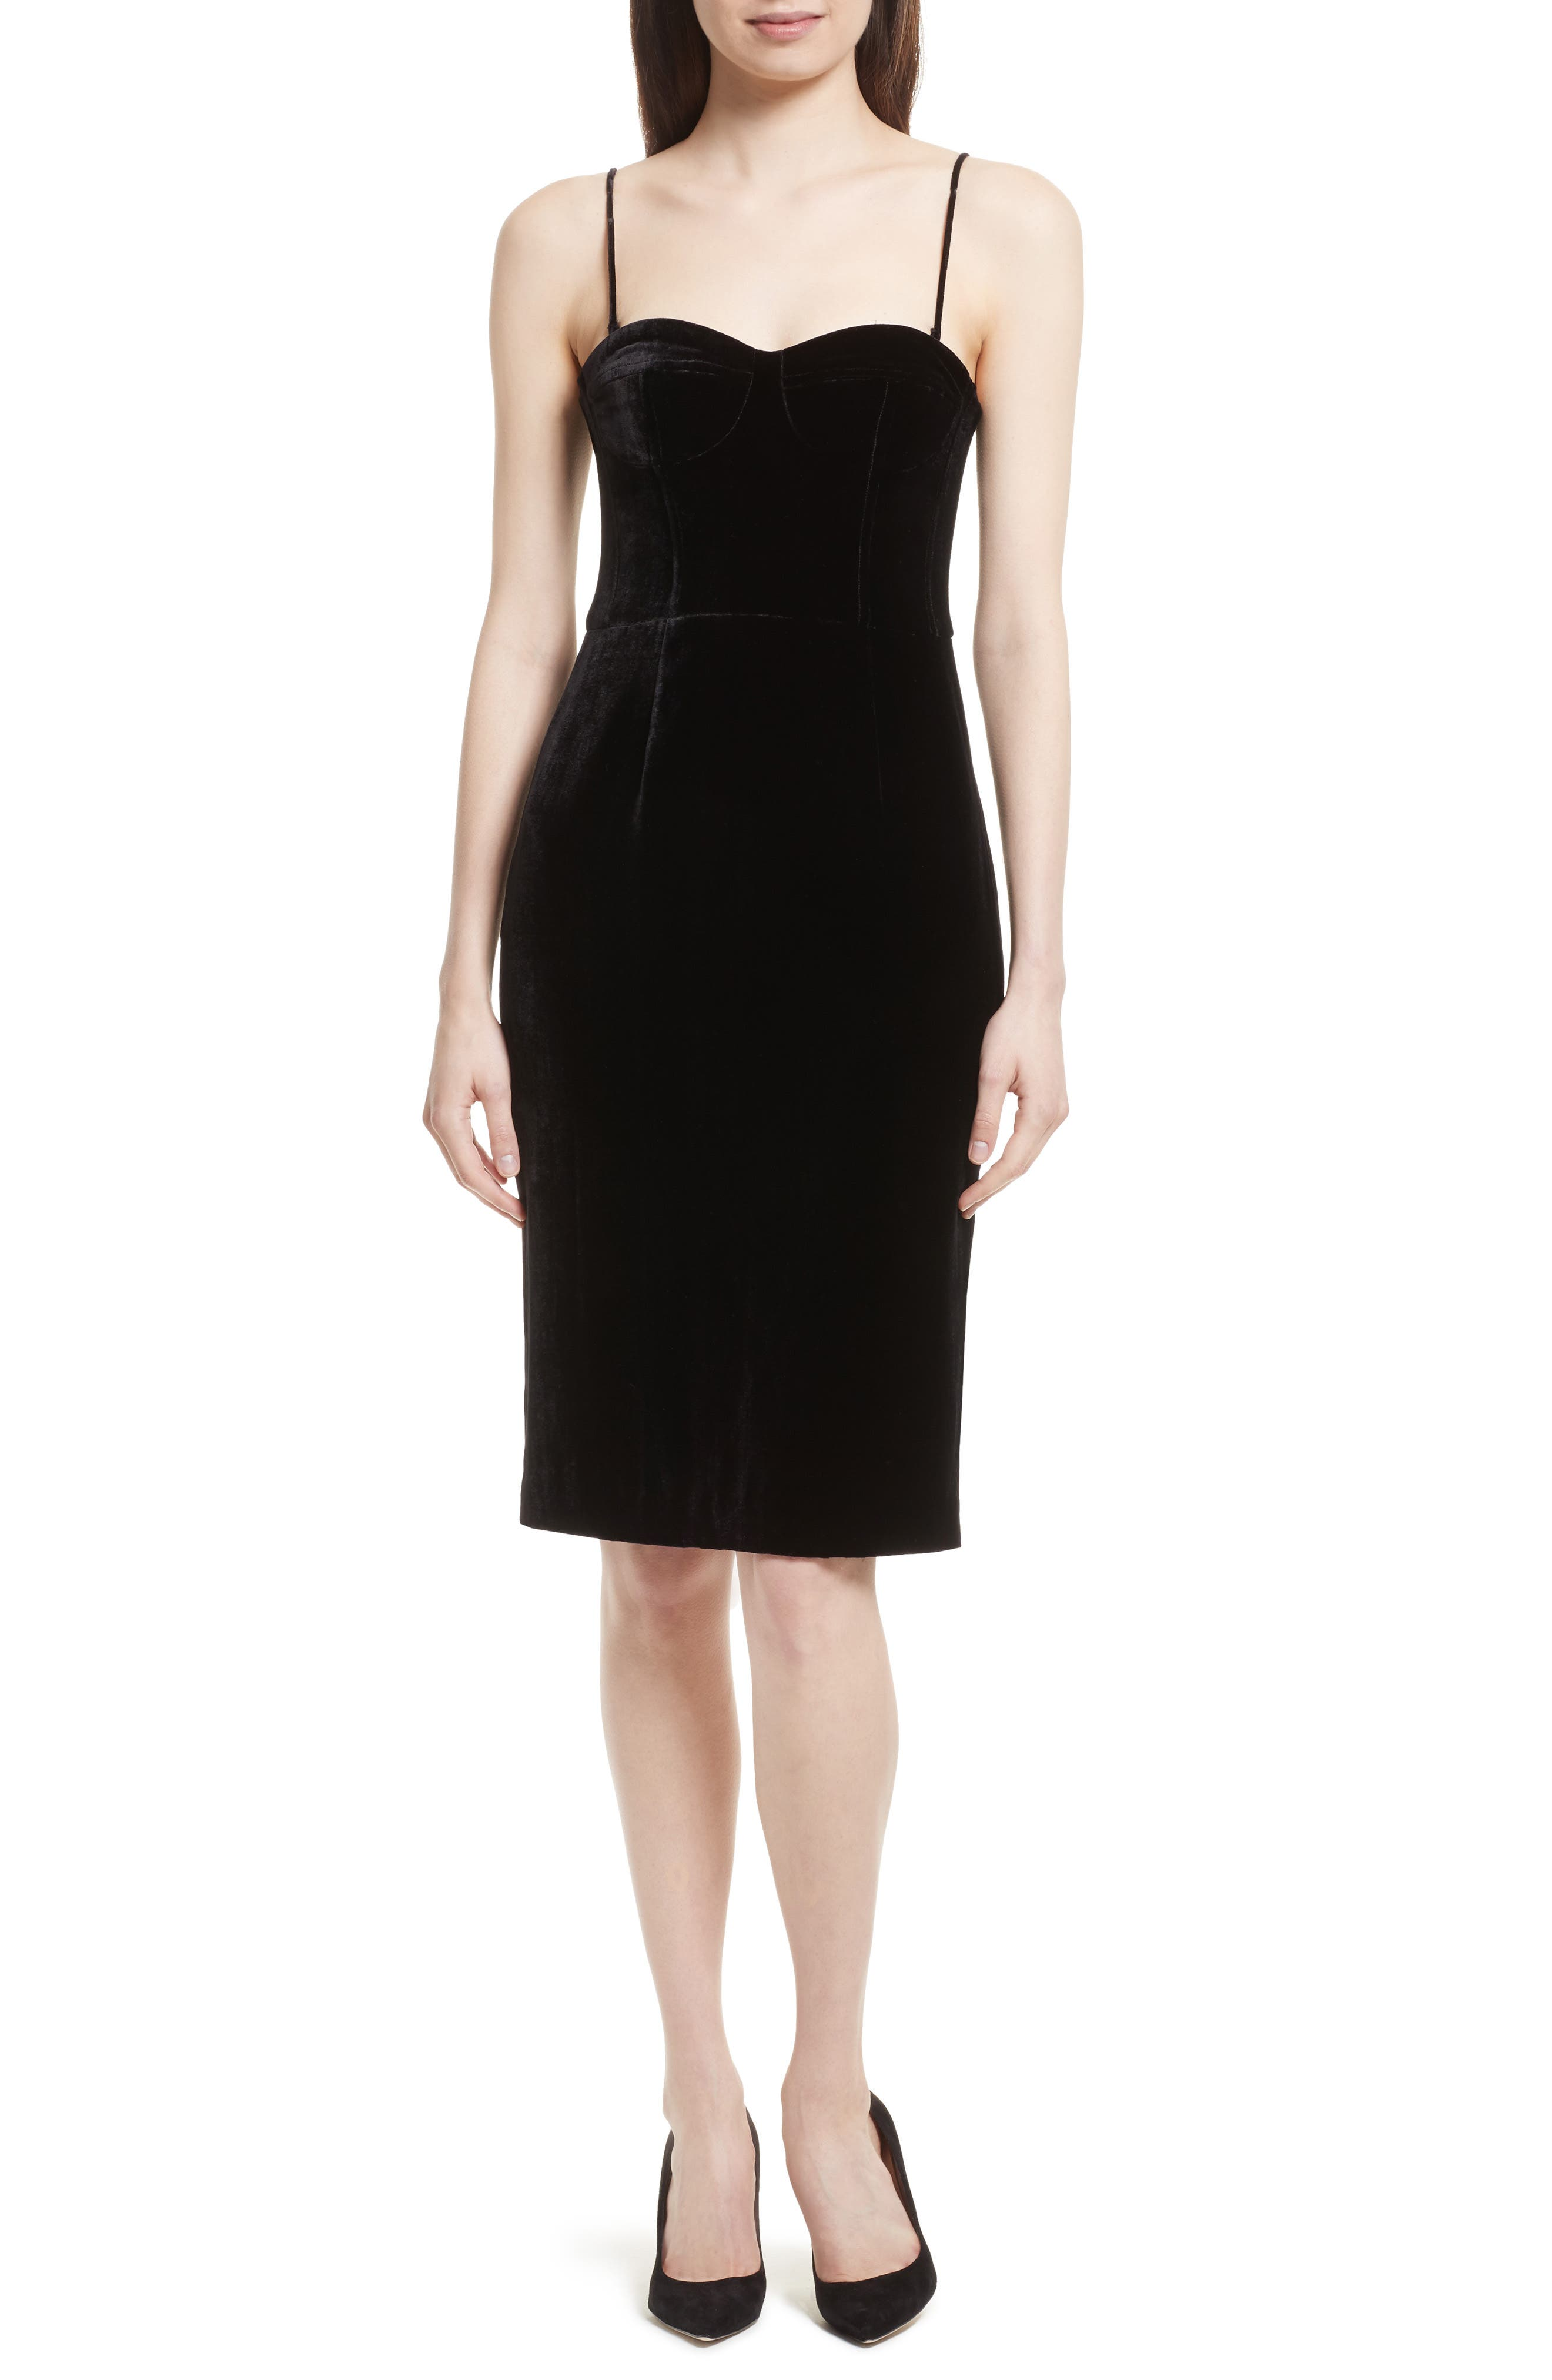 Alternate Image 1 Selected - Theory Luxe Velvet Corset Dress